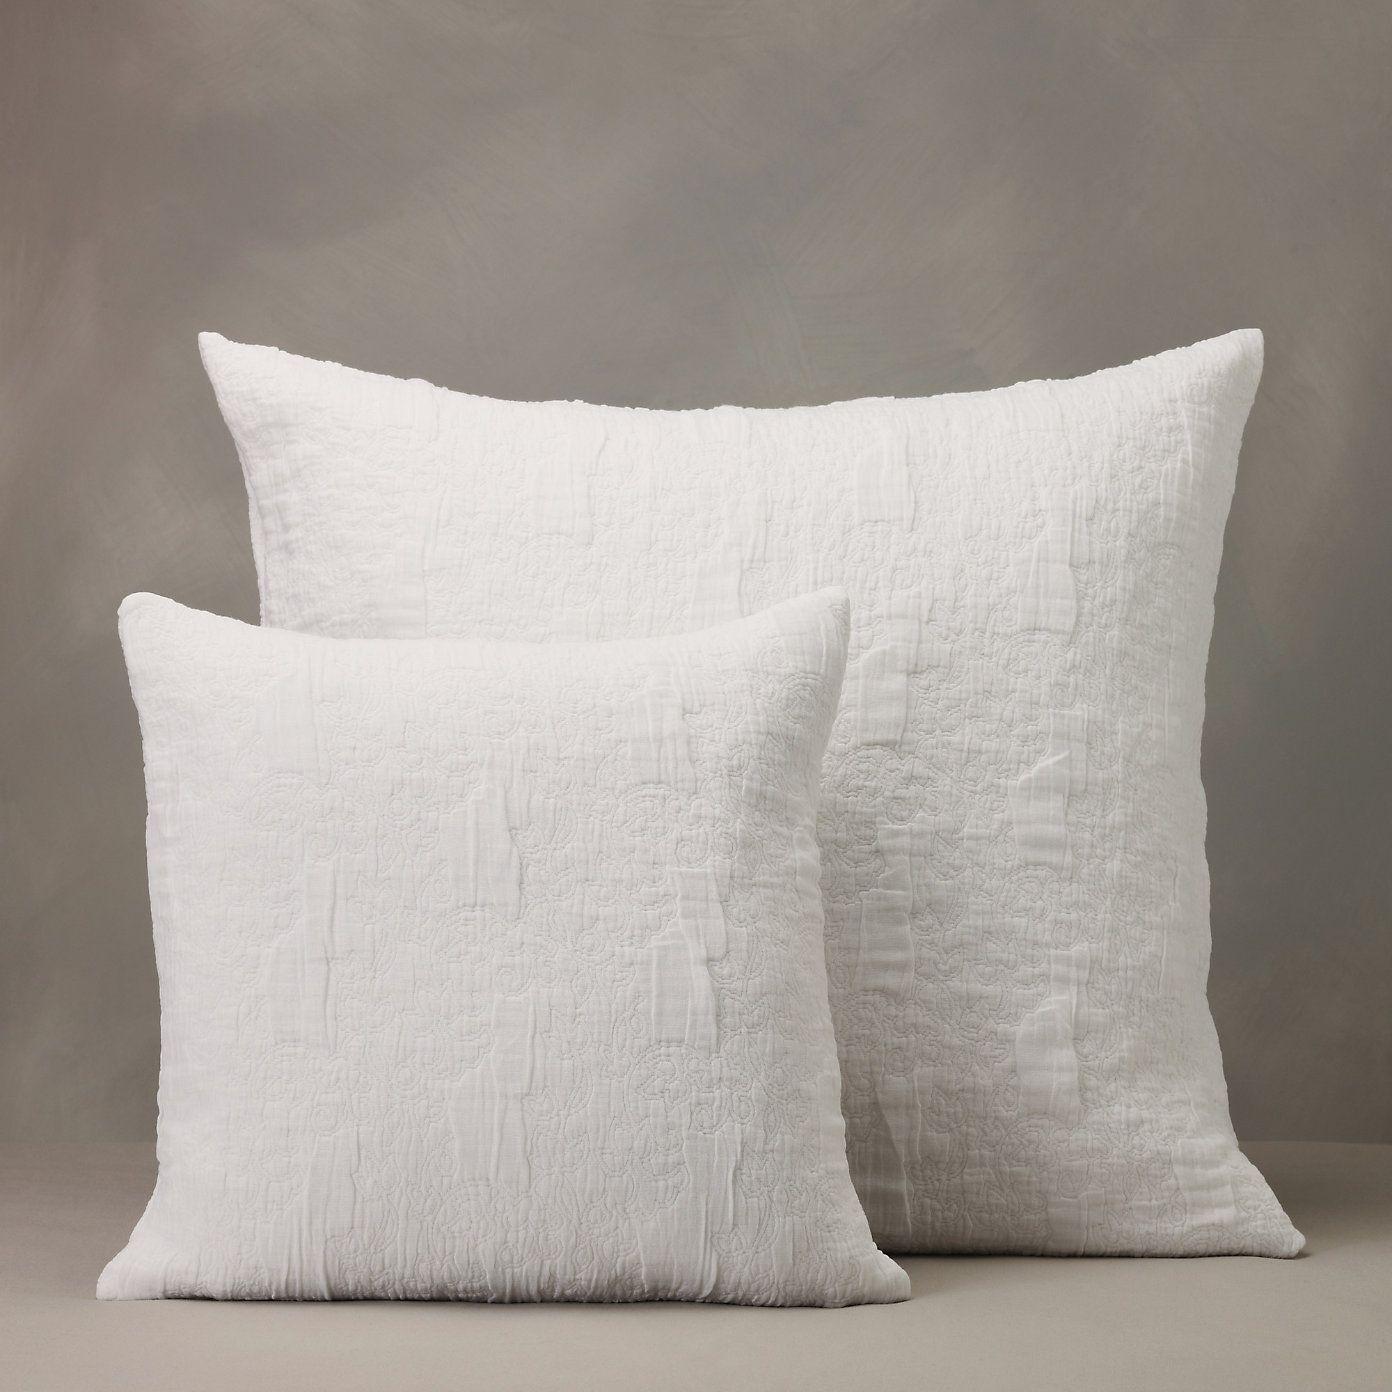 Buy Bedroom Bedspreads & Cushions Copenhagen Cushion Covers